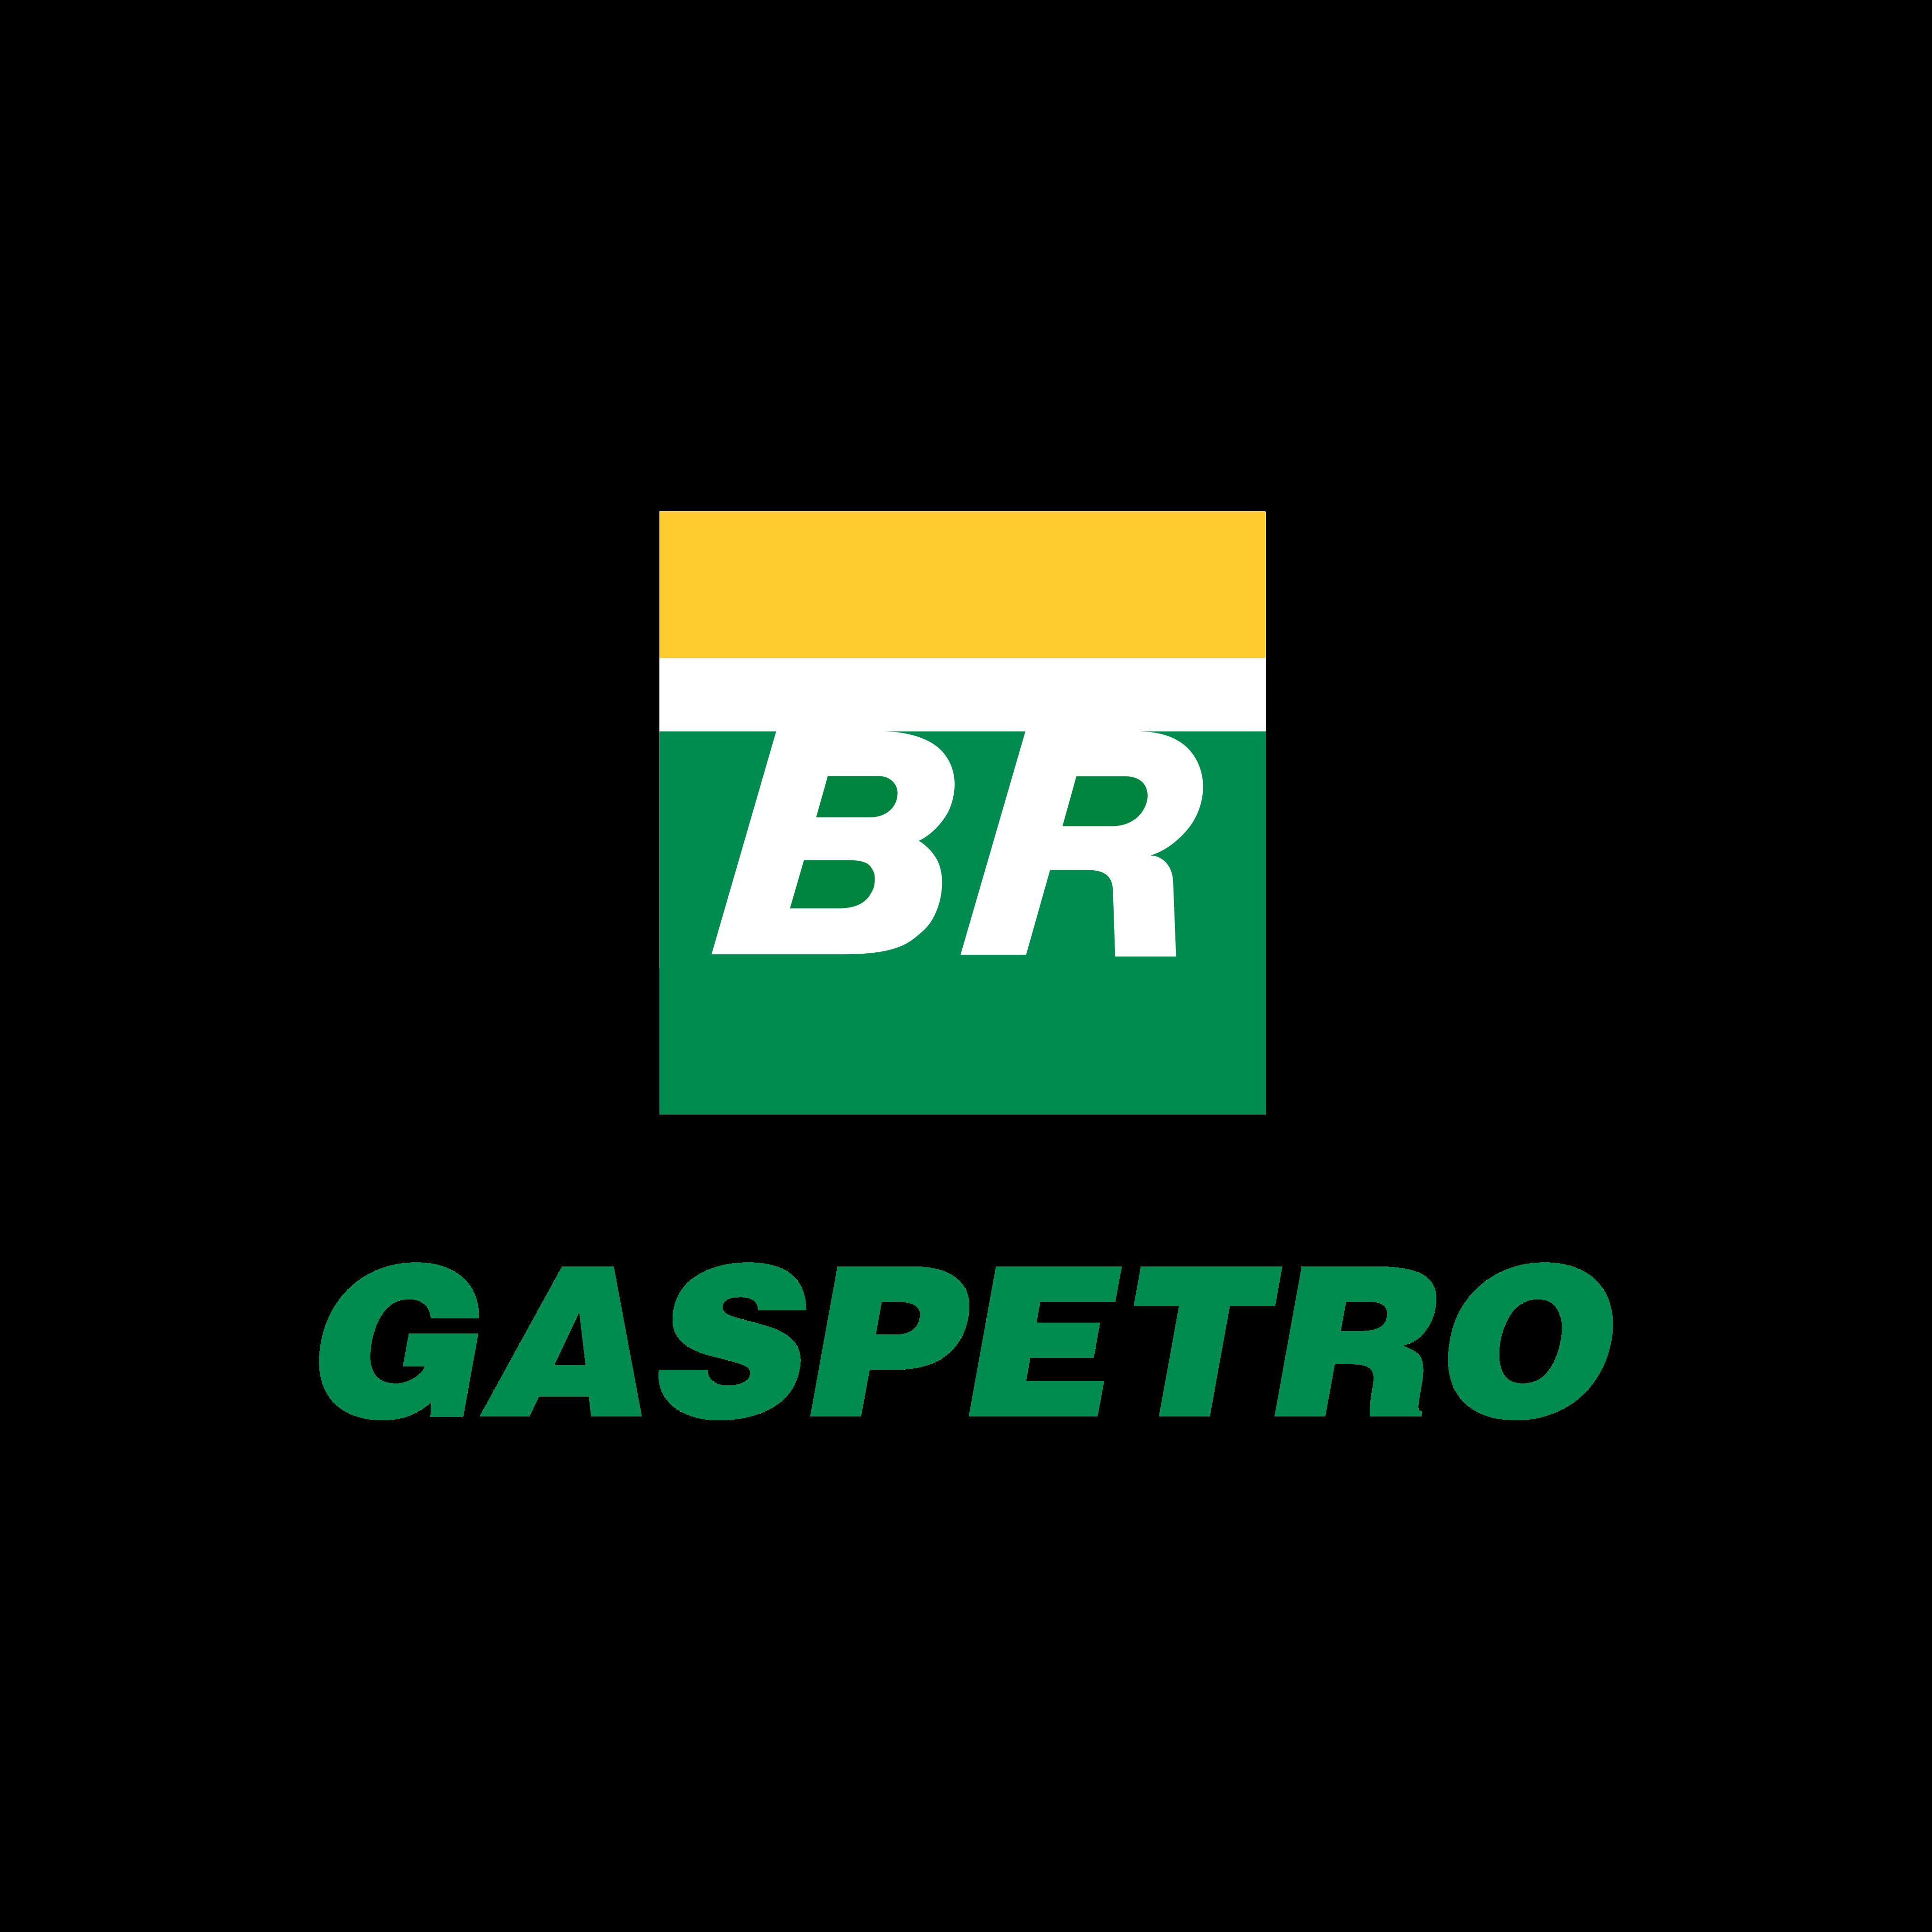 Gaspetro Logo PNG.